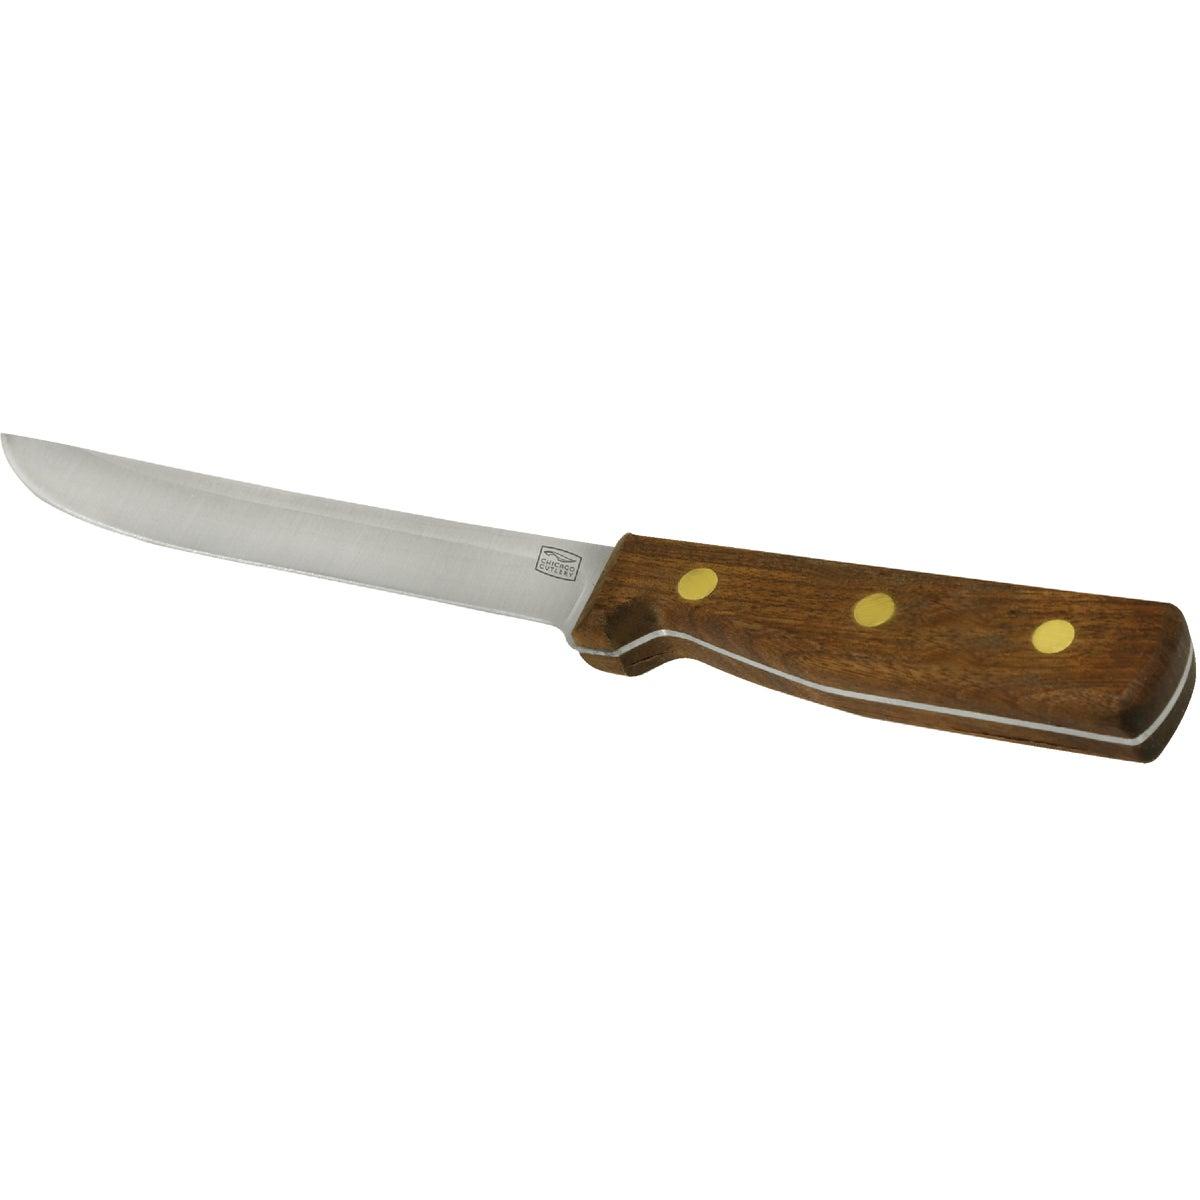 "6"" UTILITY KNIFE"